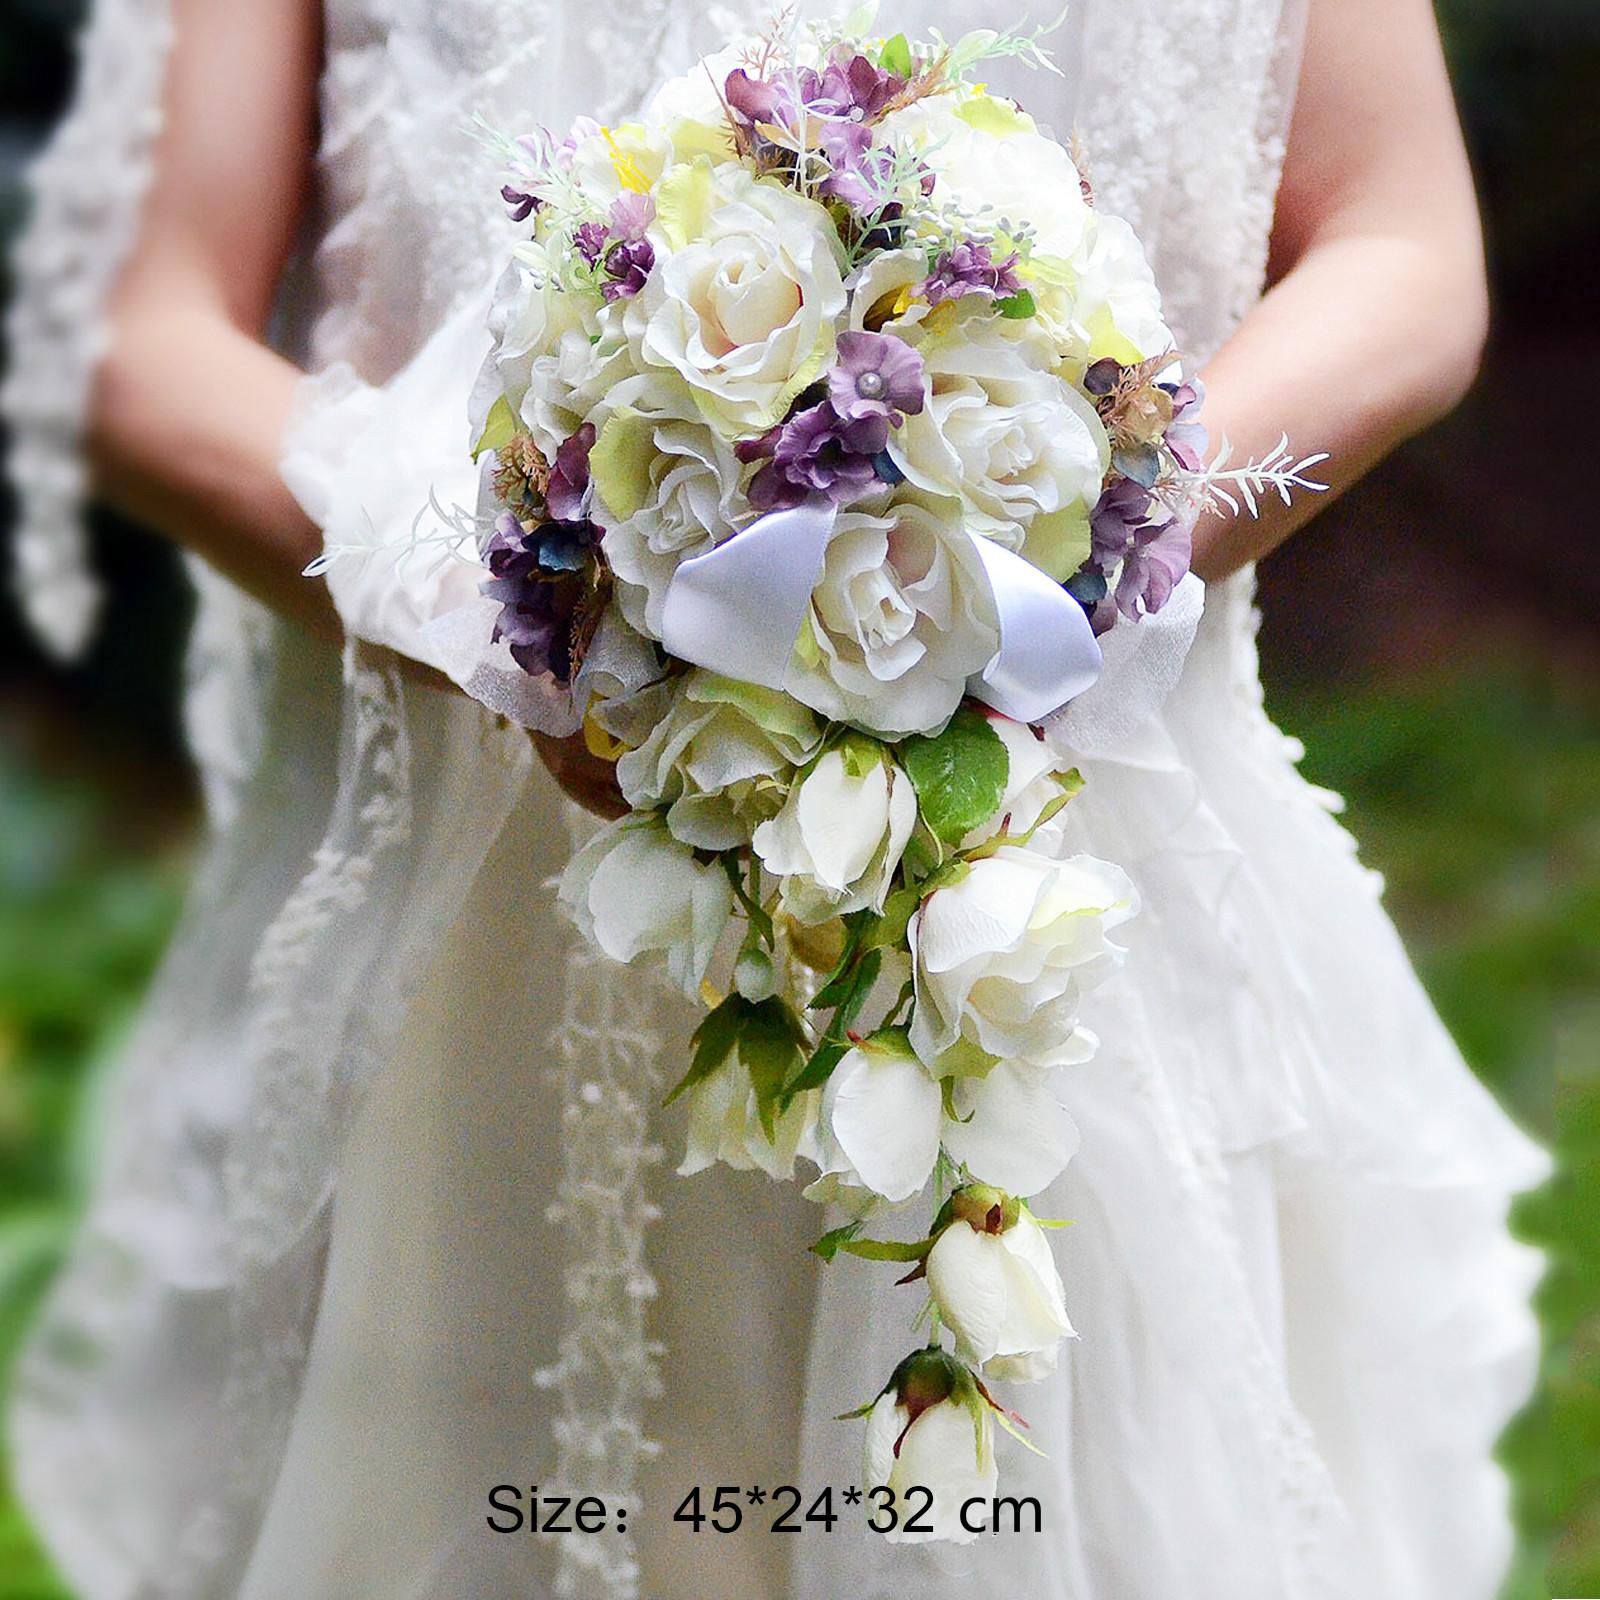 32x24x45 Cm Wedding Decoration Waterfall Bride Flower Bouquet